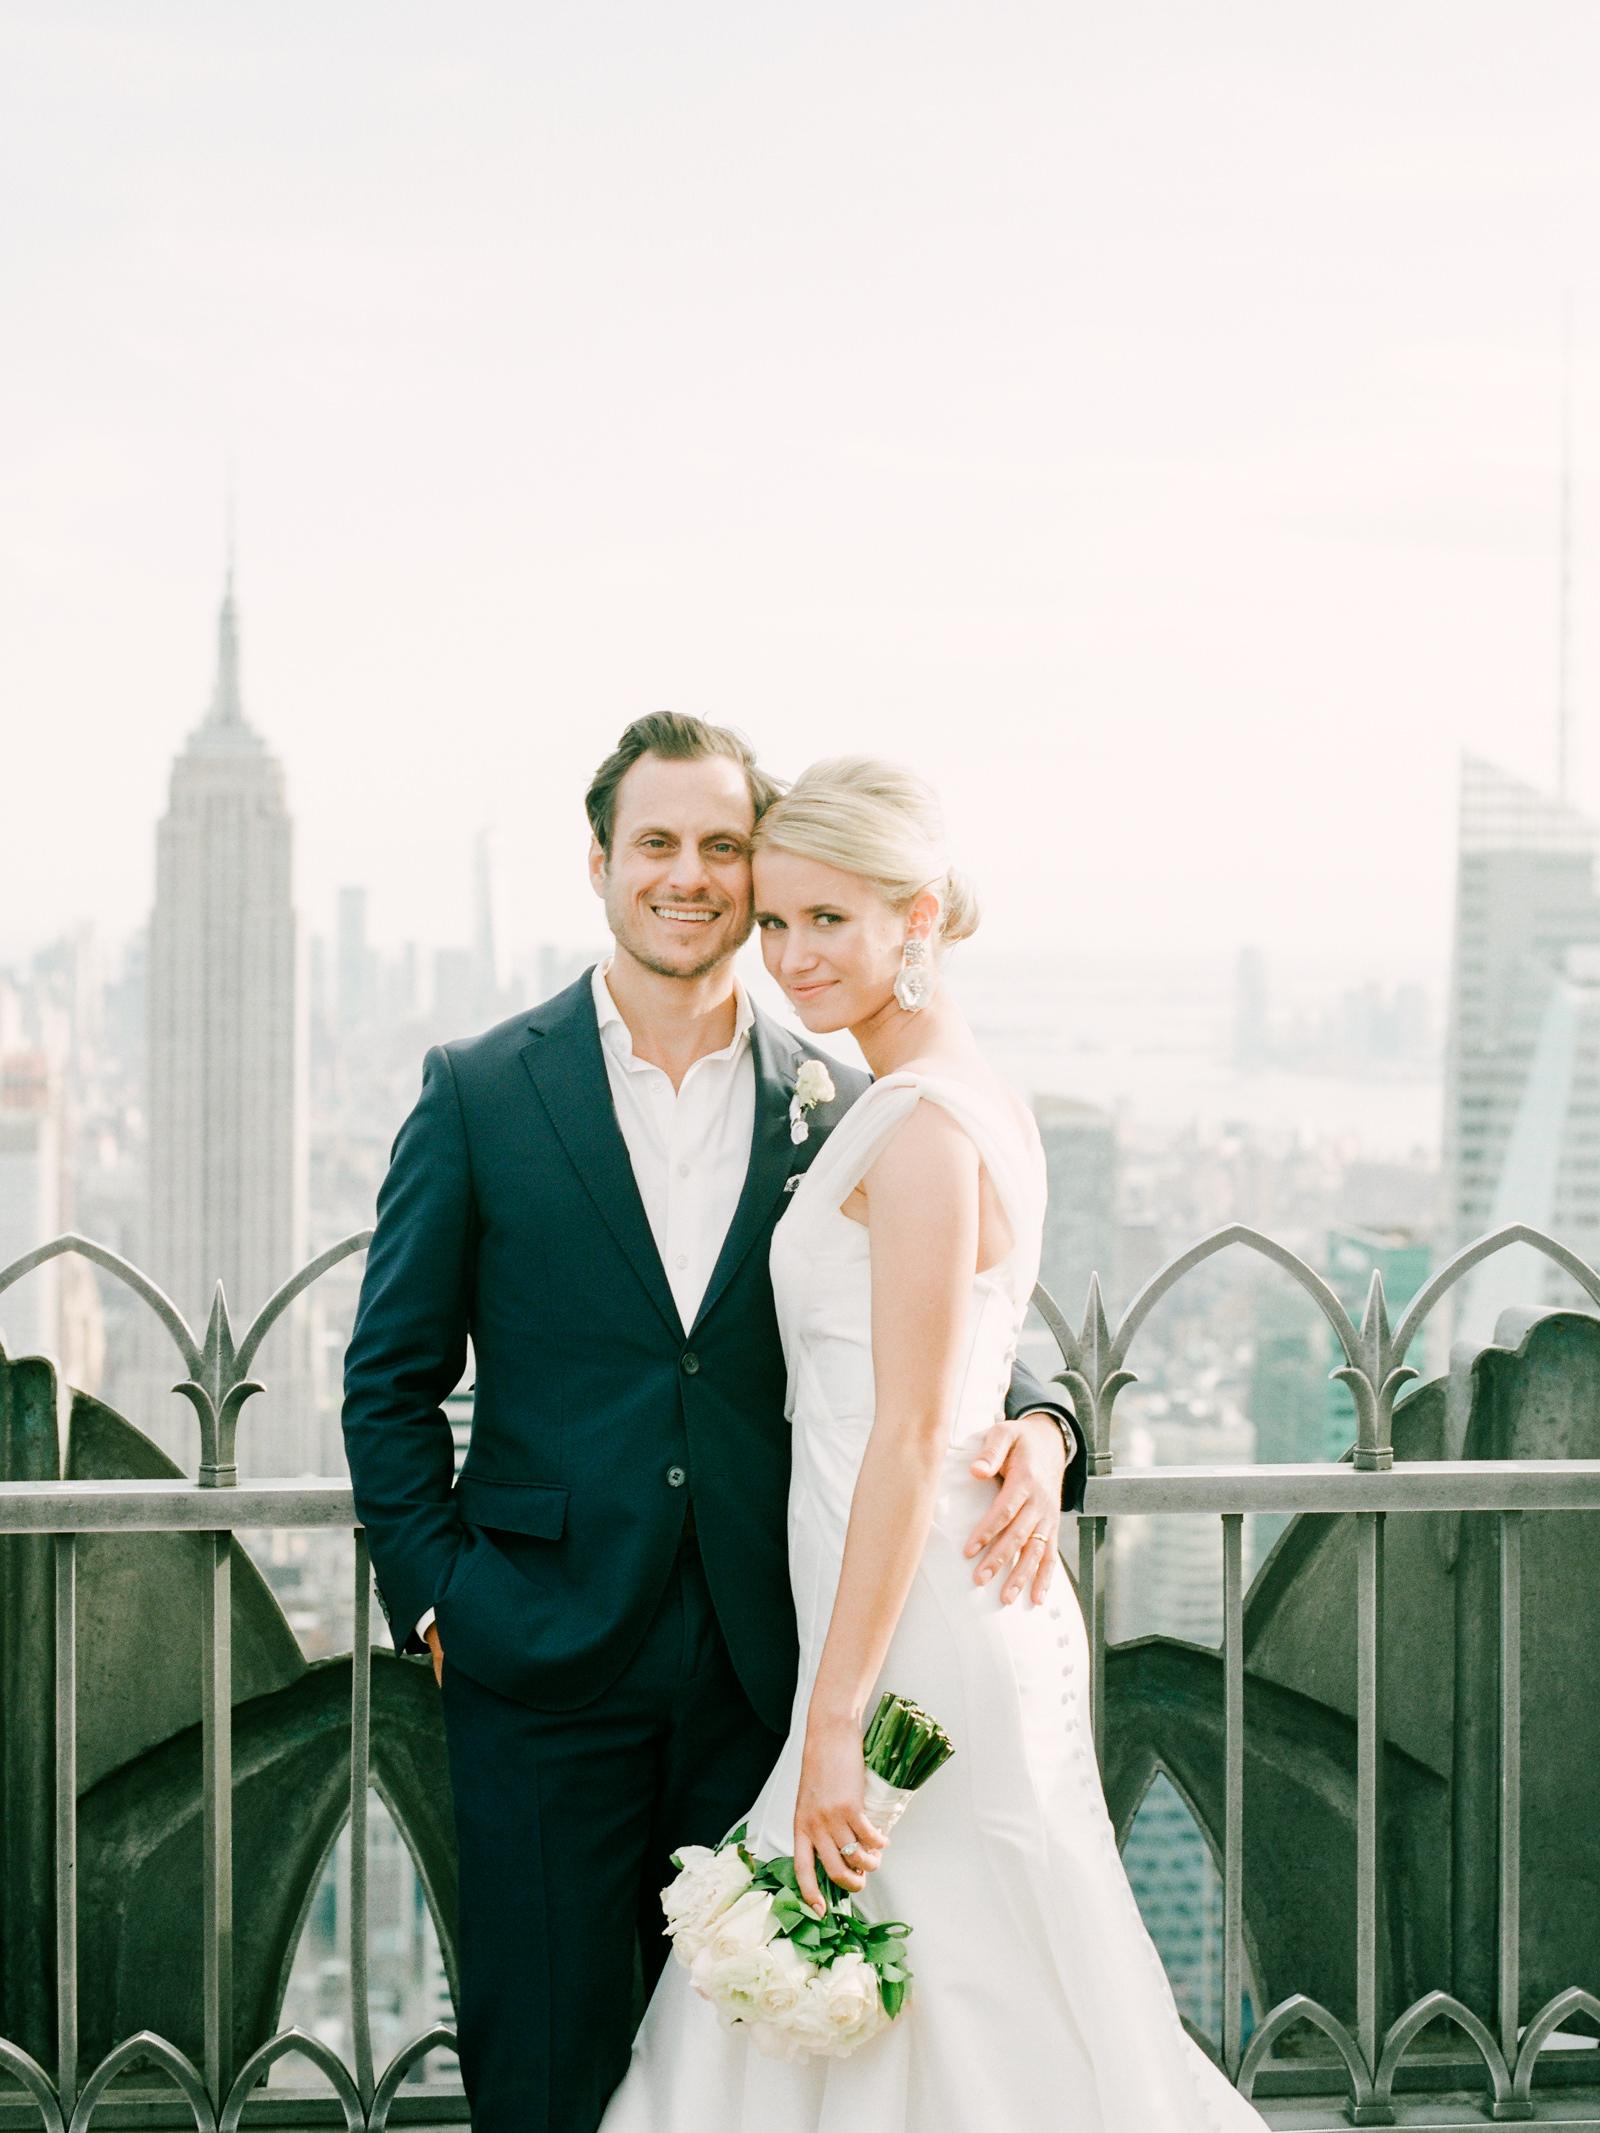 Intimate-NYC_wedding_ by Tanya Isaeva-160.jpg